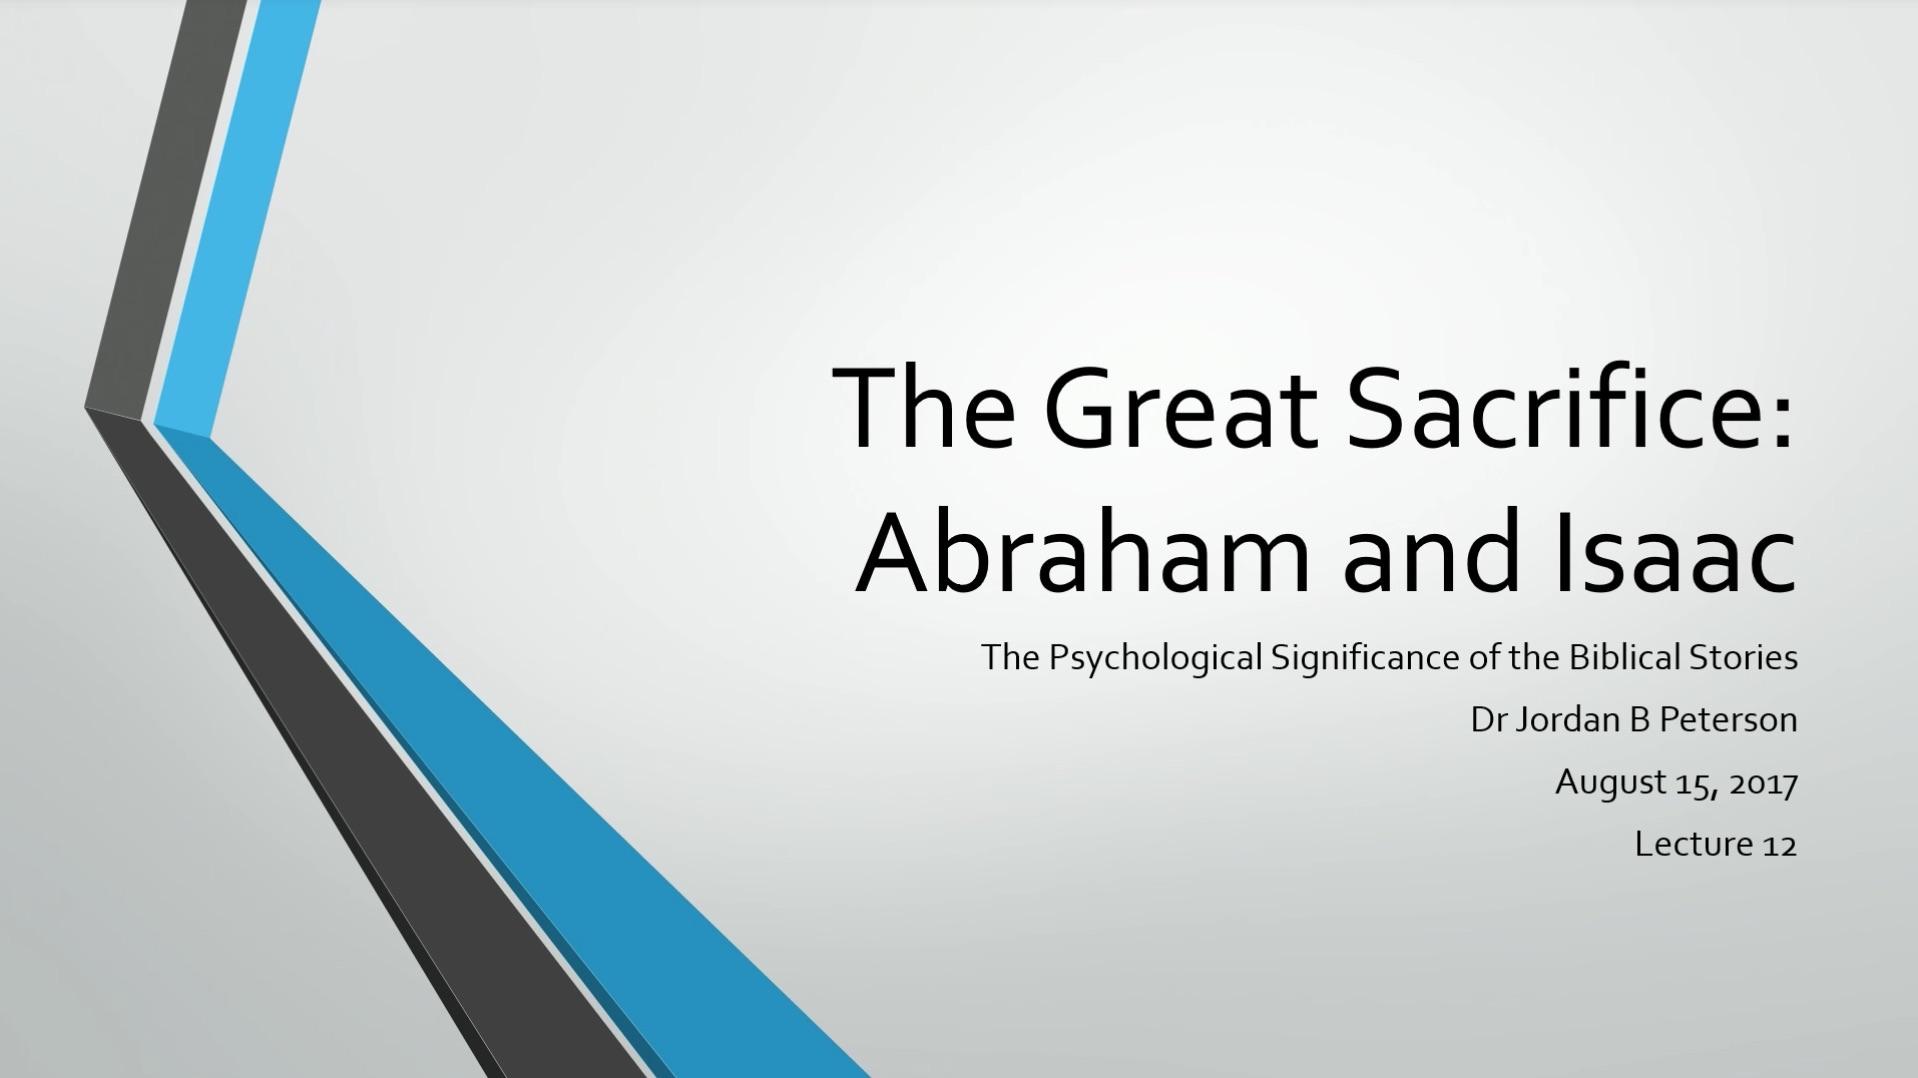 biblical series xii the great sacrifice abraham and isaac